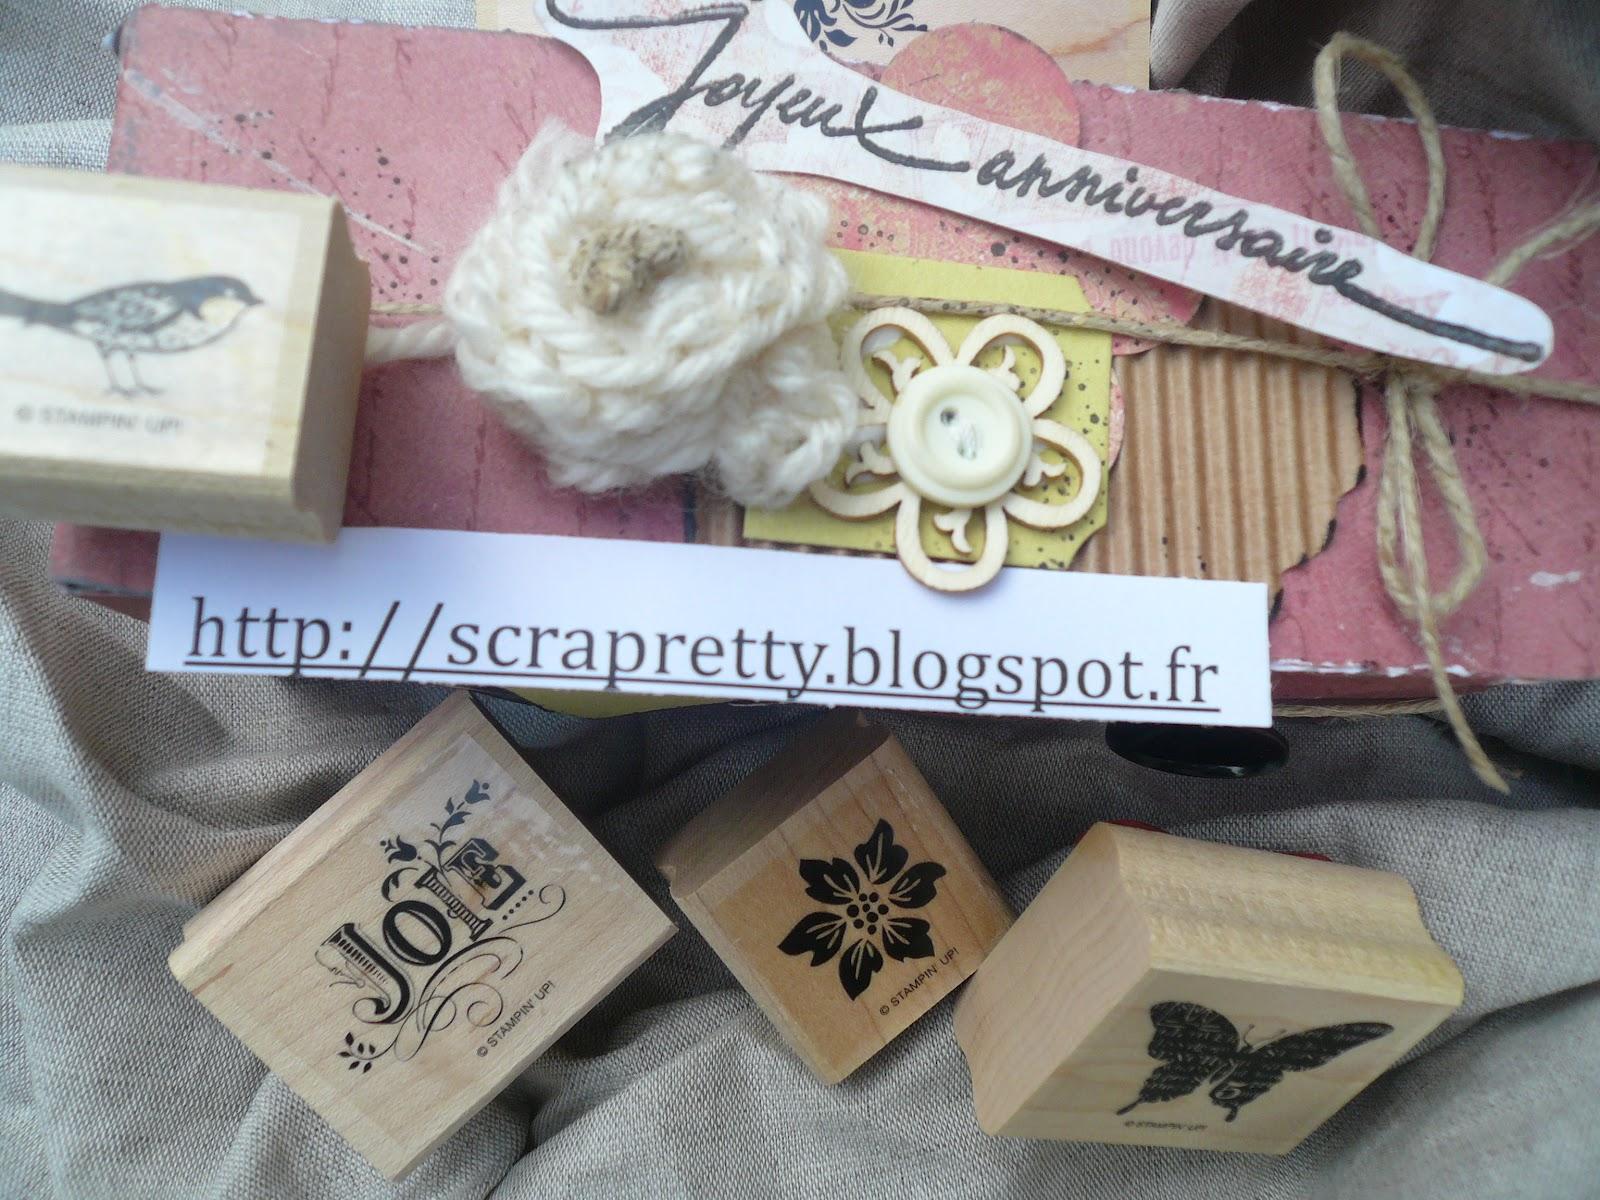 scrapretty tutoriel de la boite joyeux anniversaire. Black Bedroom Furniture Sets. Home Design Ideas